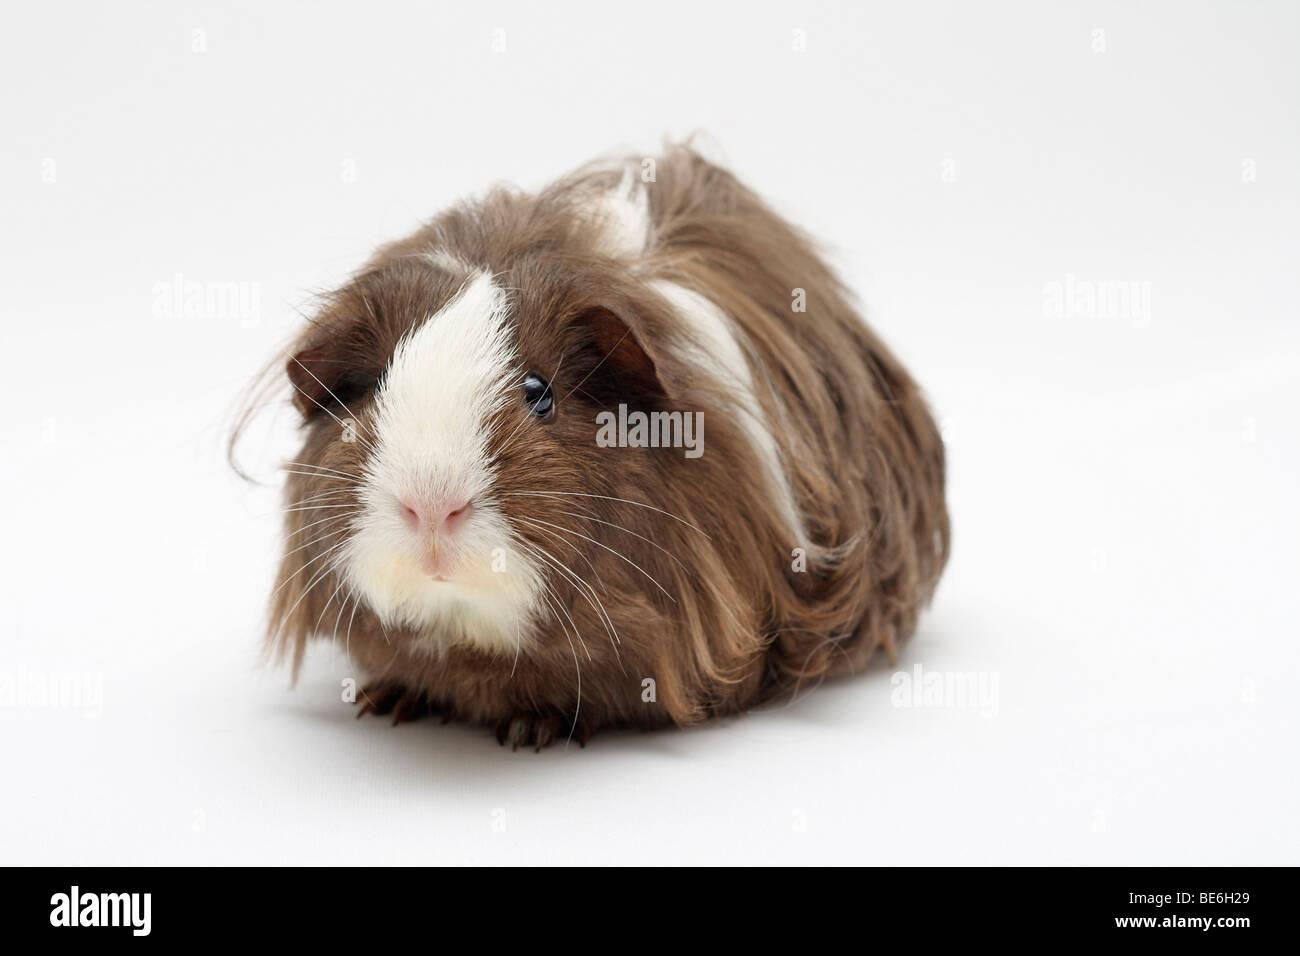 Sheltie guinea pigs - photo#46